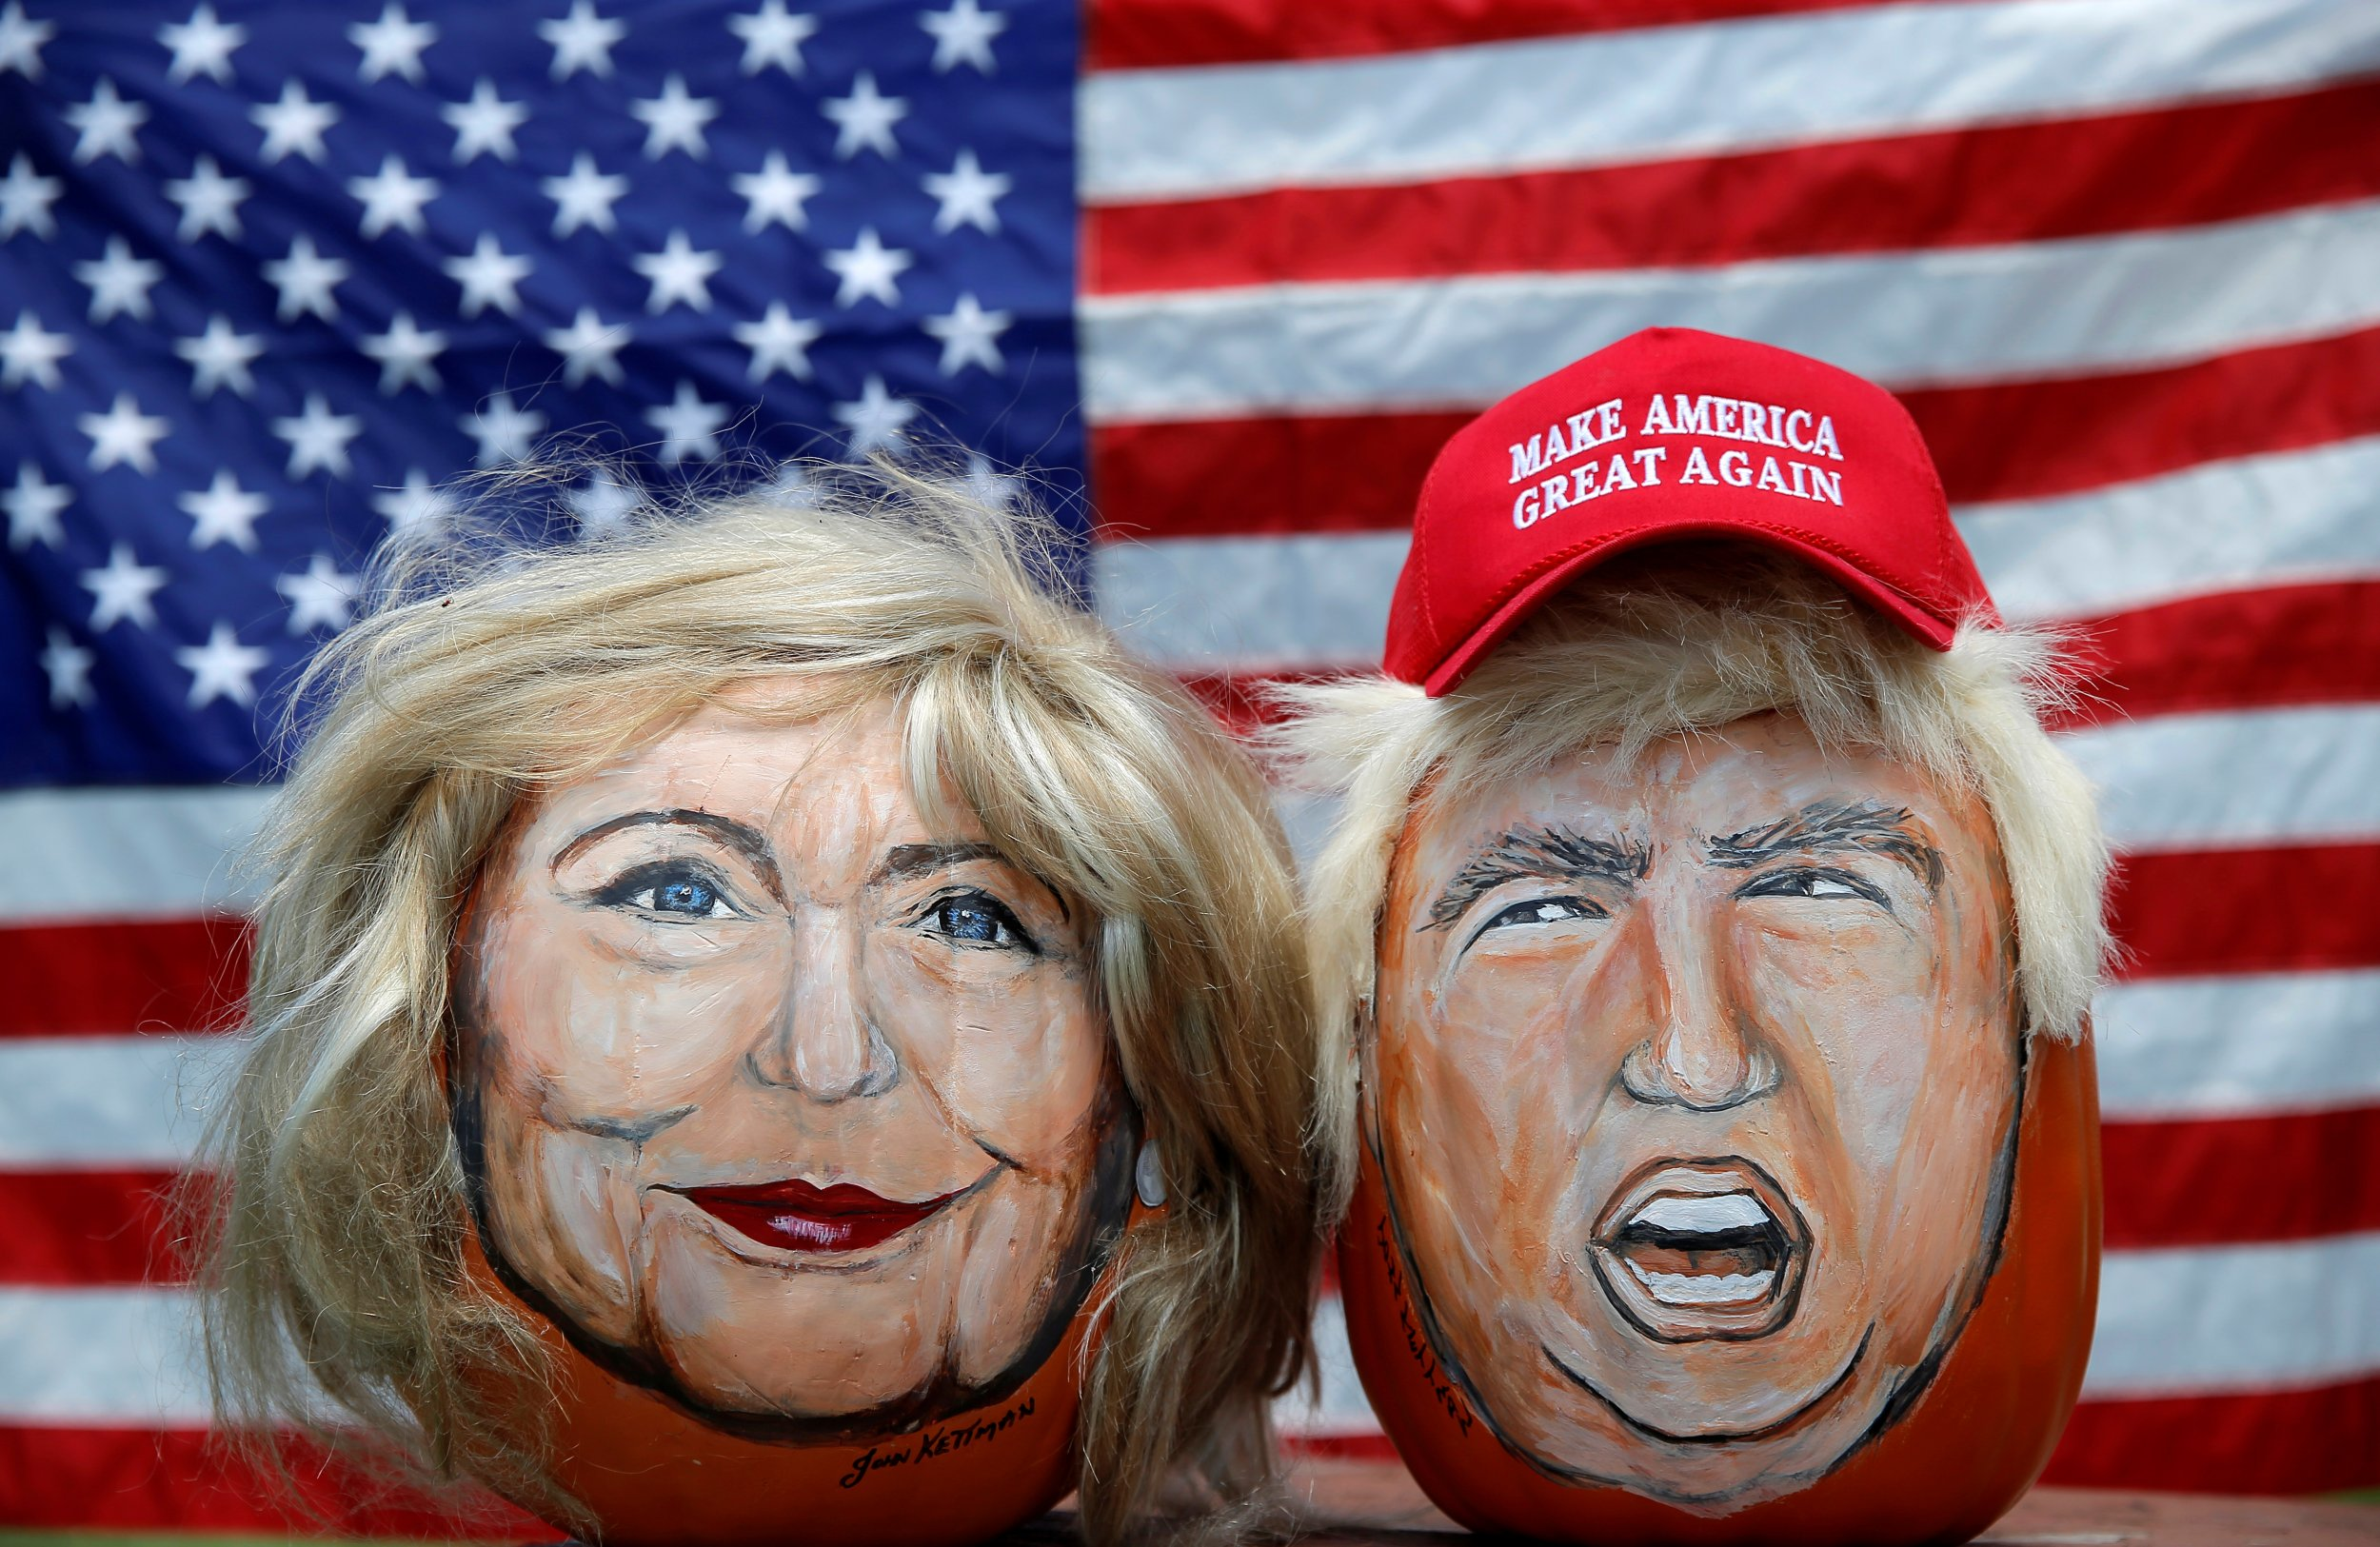 0725_Donald_Trumpp_leads_Hillary_Clinton_polls_01